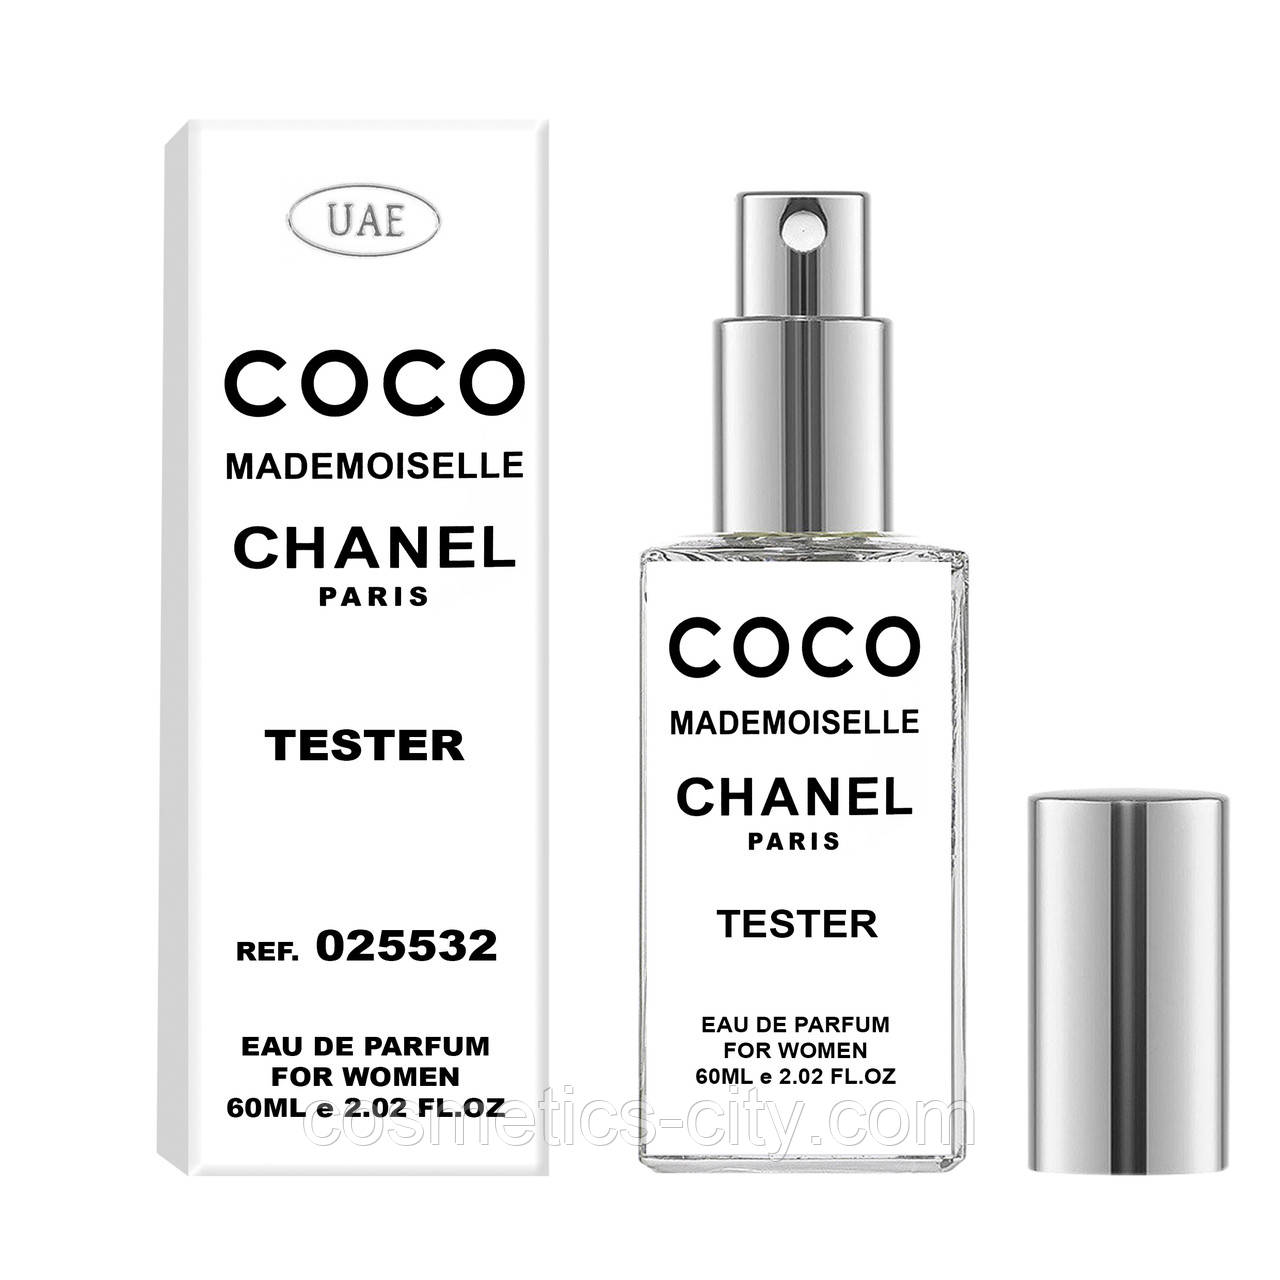 Тестер женский UAE Chanel Coco Mademoiselle, 60 мл.